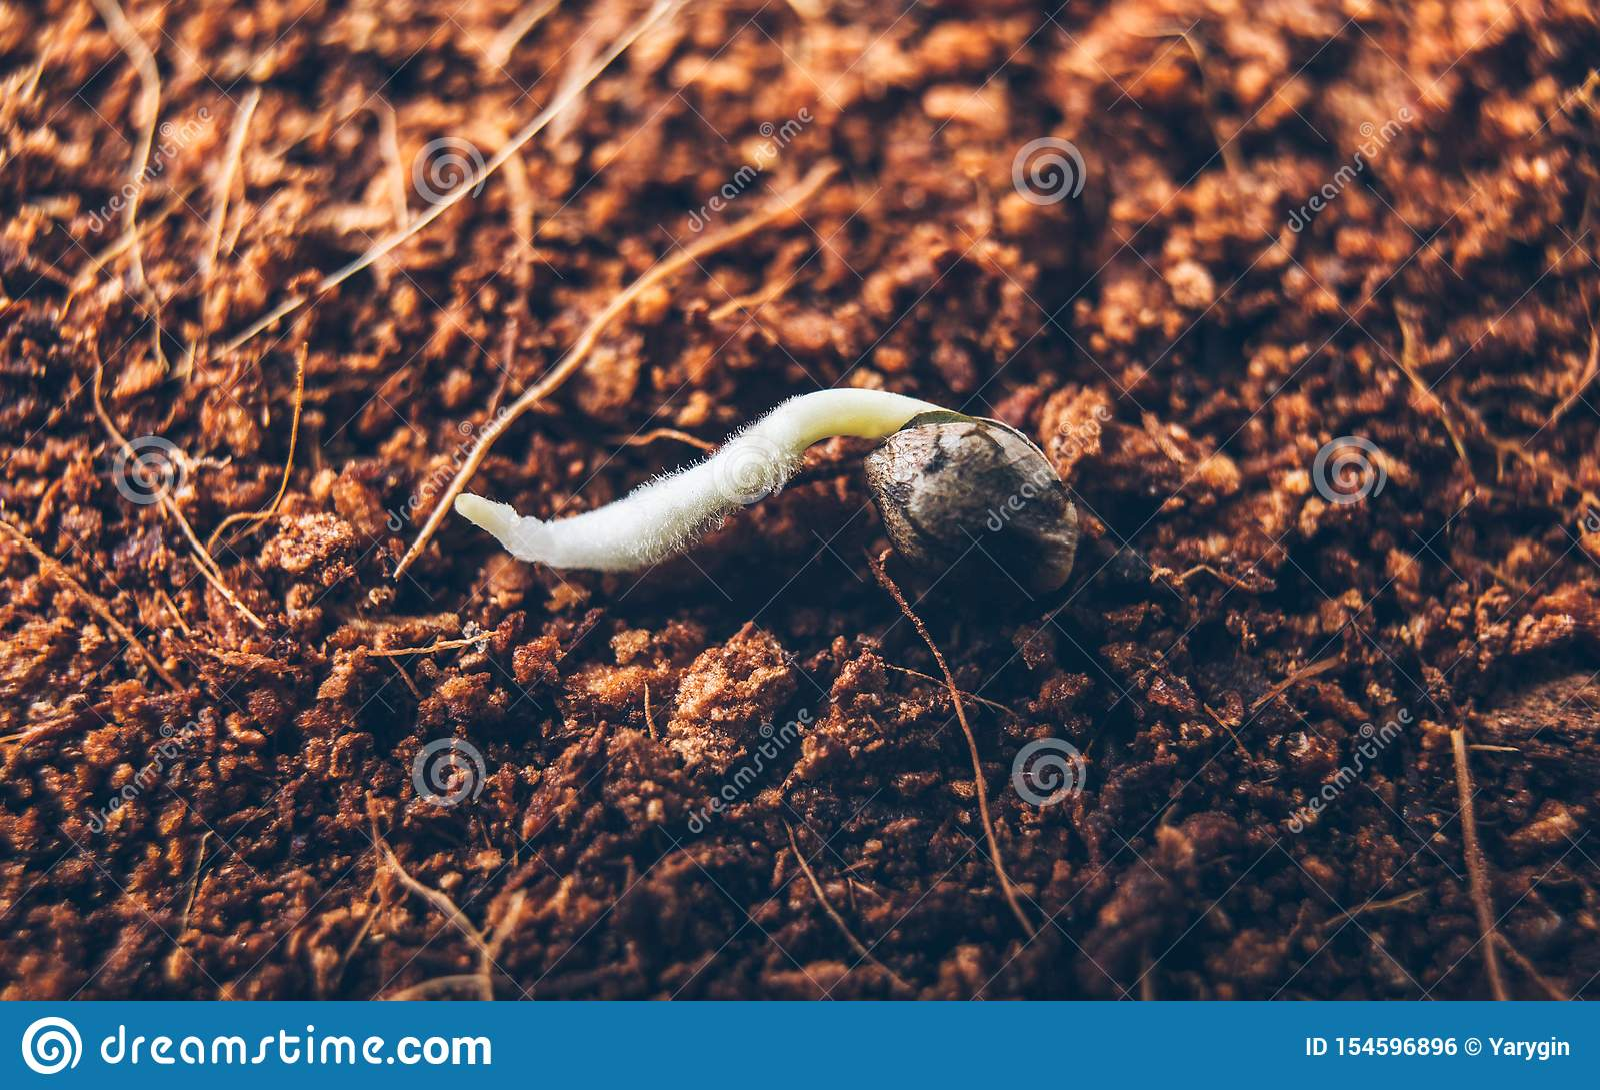 Семена марихуаны корни жареная конопля каша